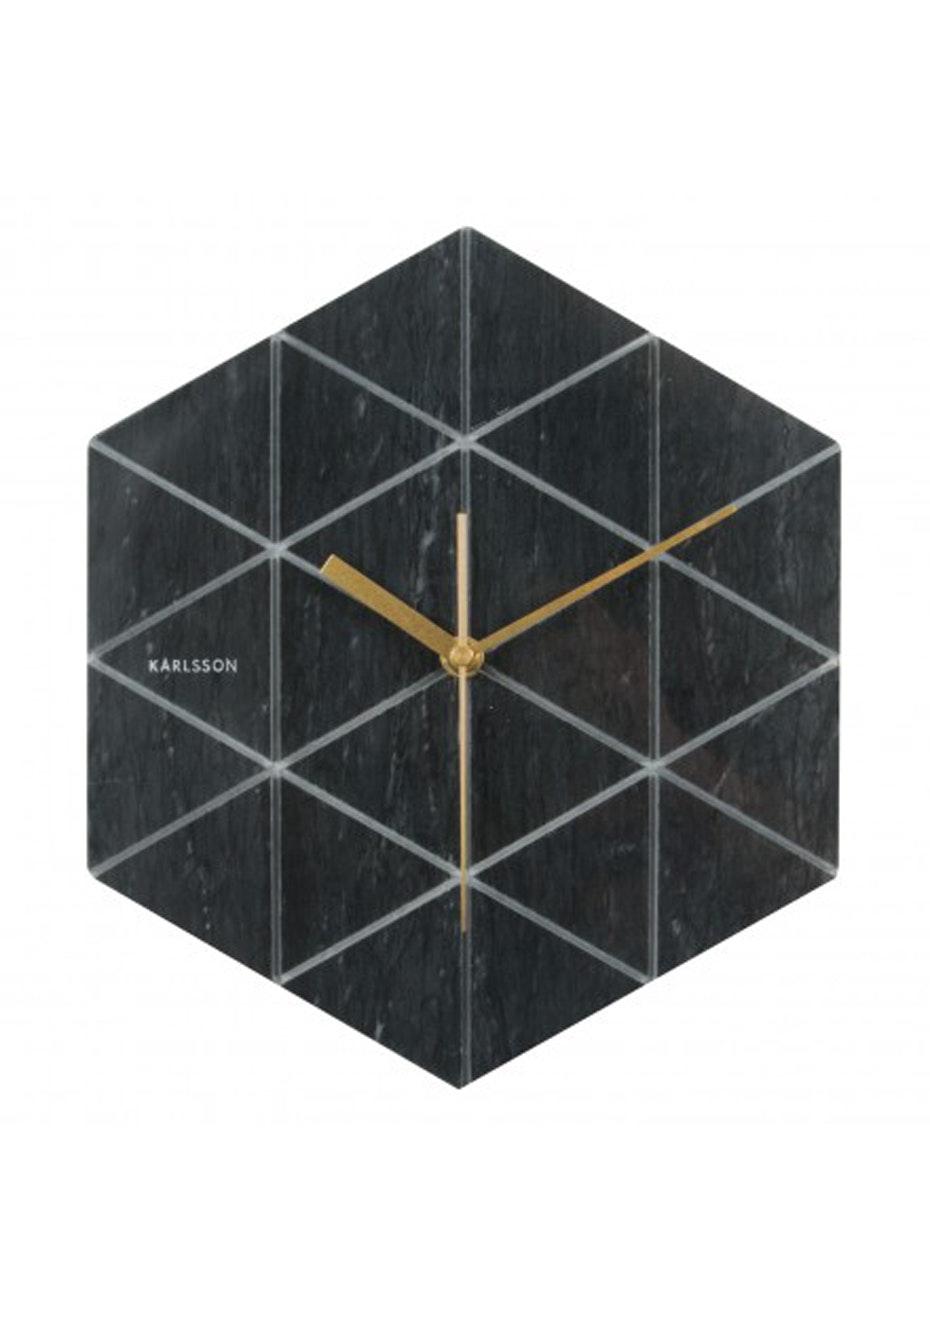 Karlsson - Wall Clock 'Marble Hexagon' - Black